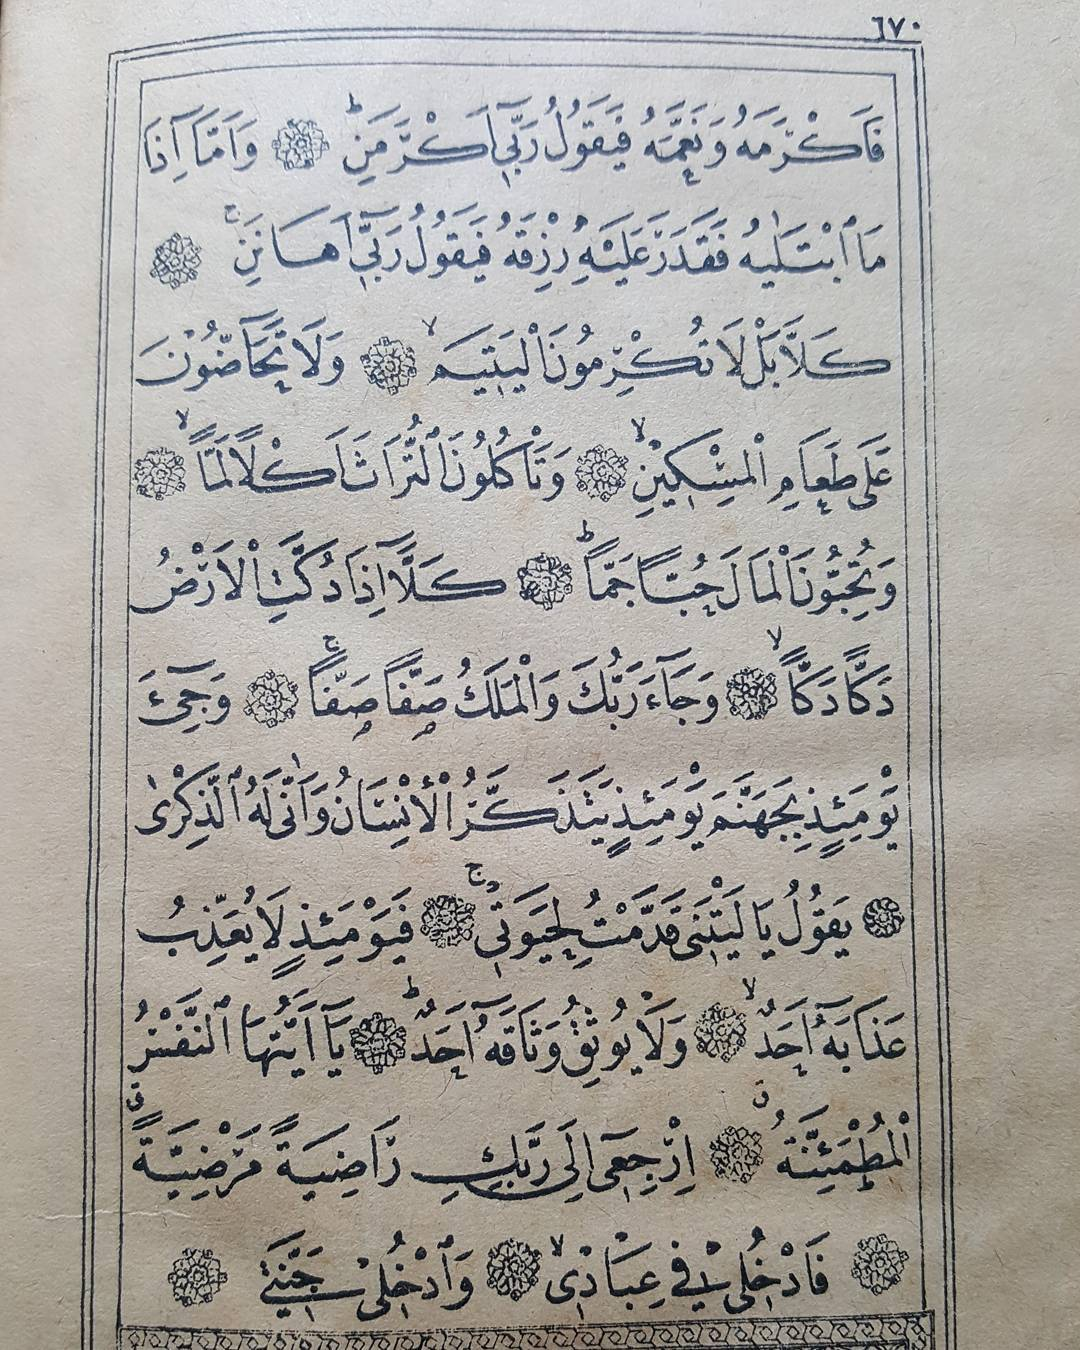 Khat Diwani Ajhalawani/Amr محمد شكر زاده  رحمه الله… 170